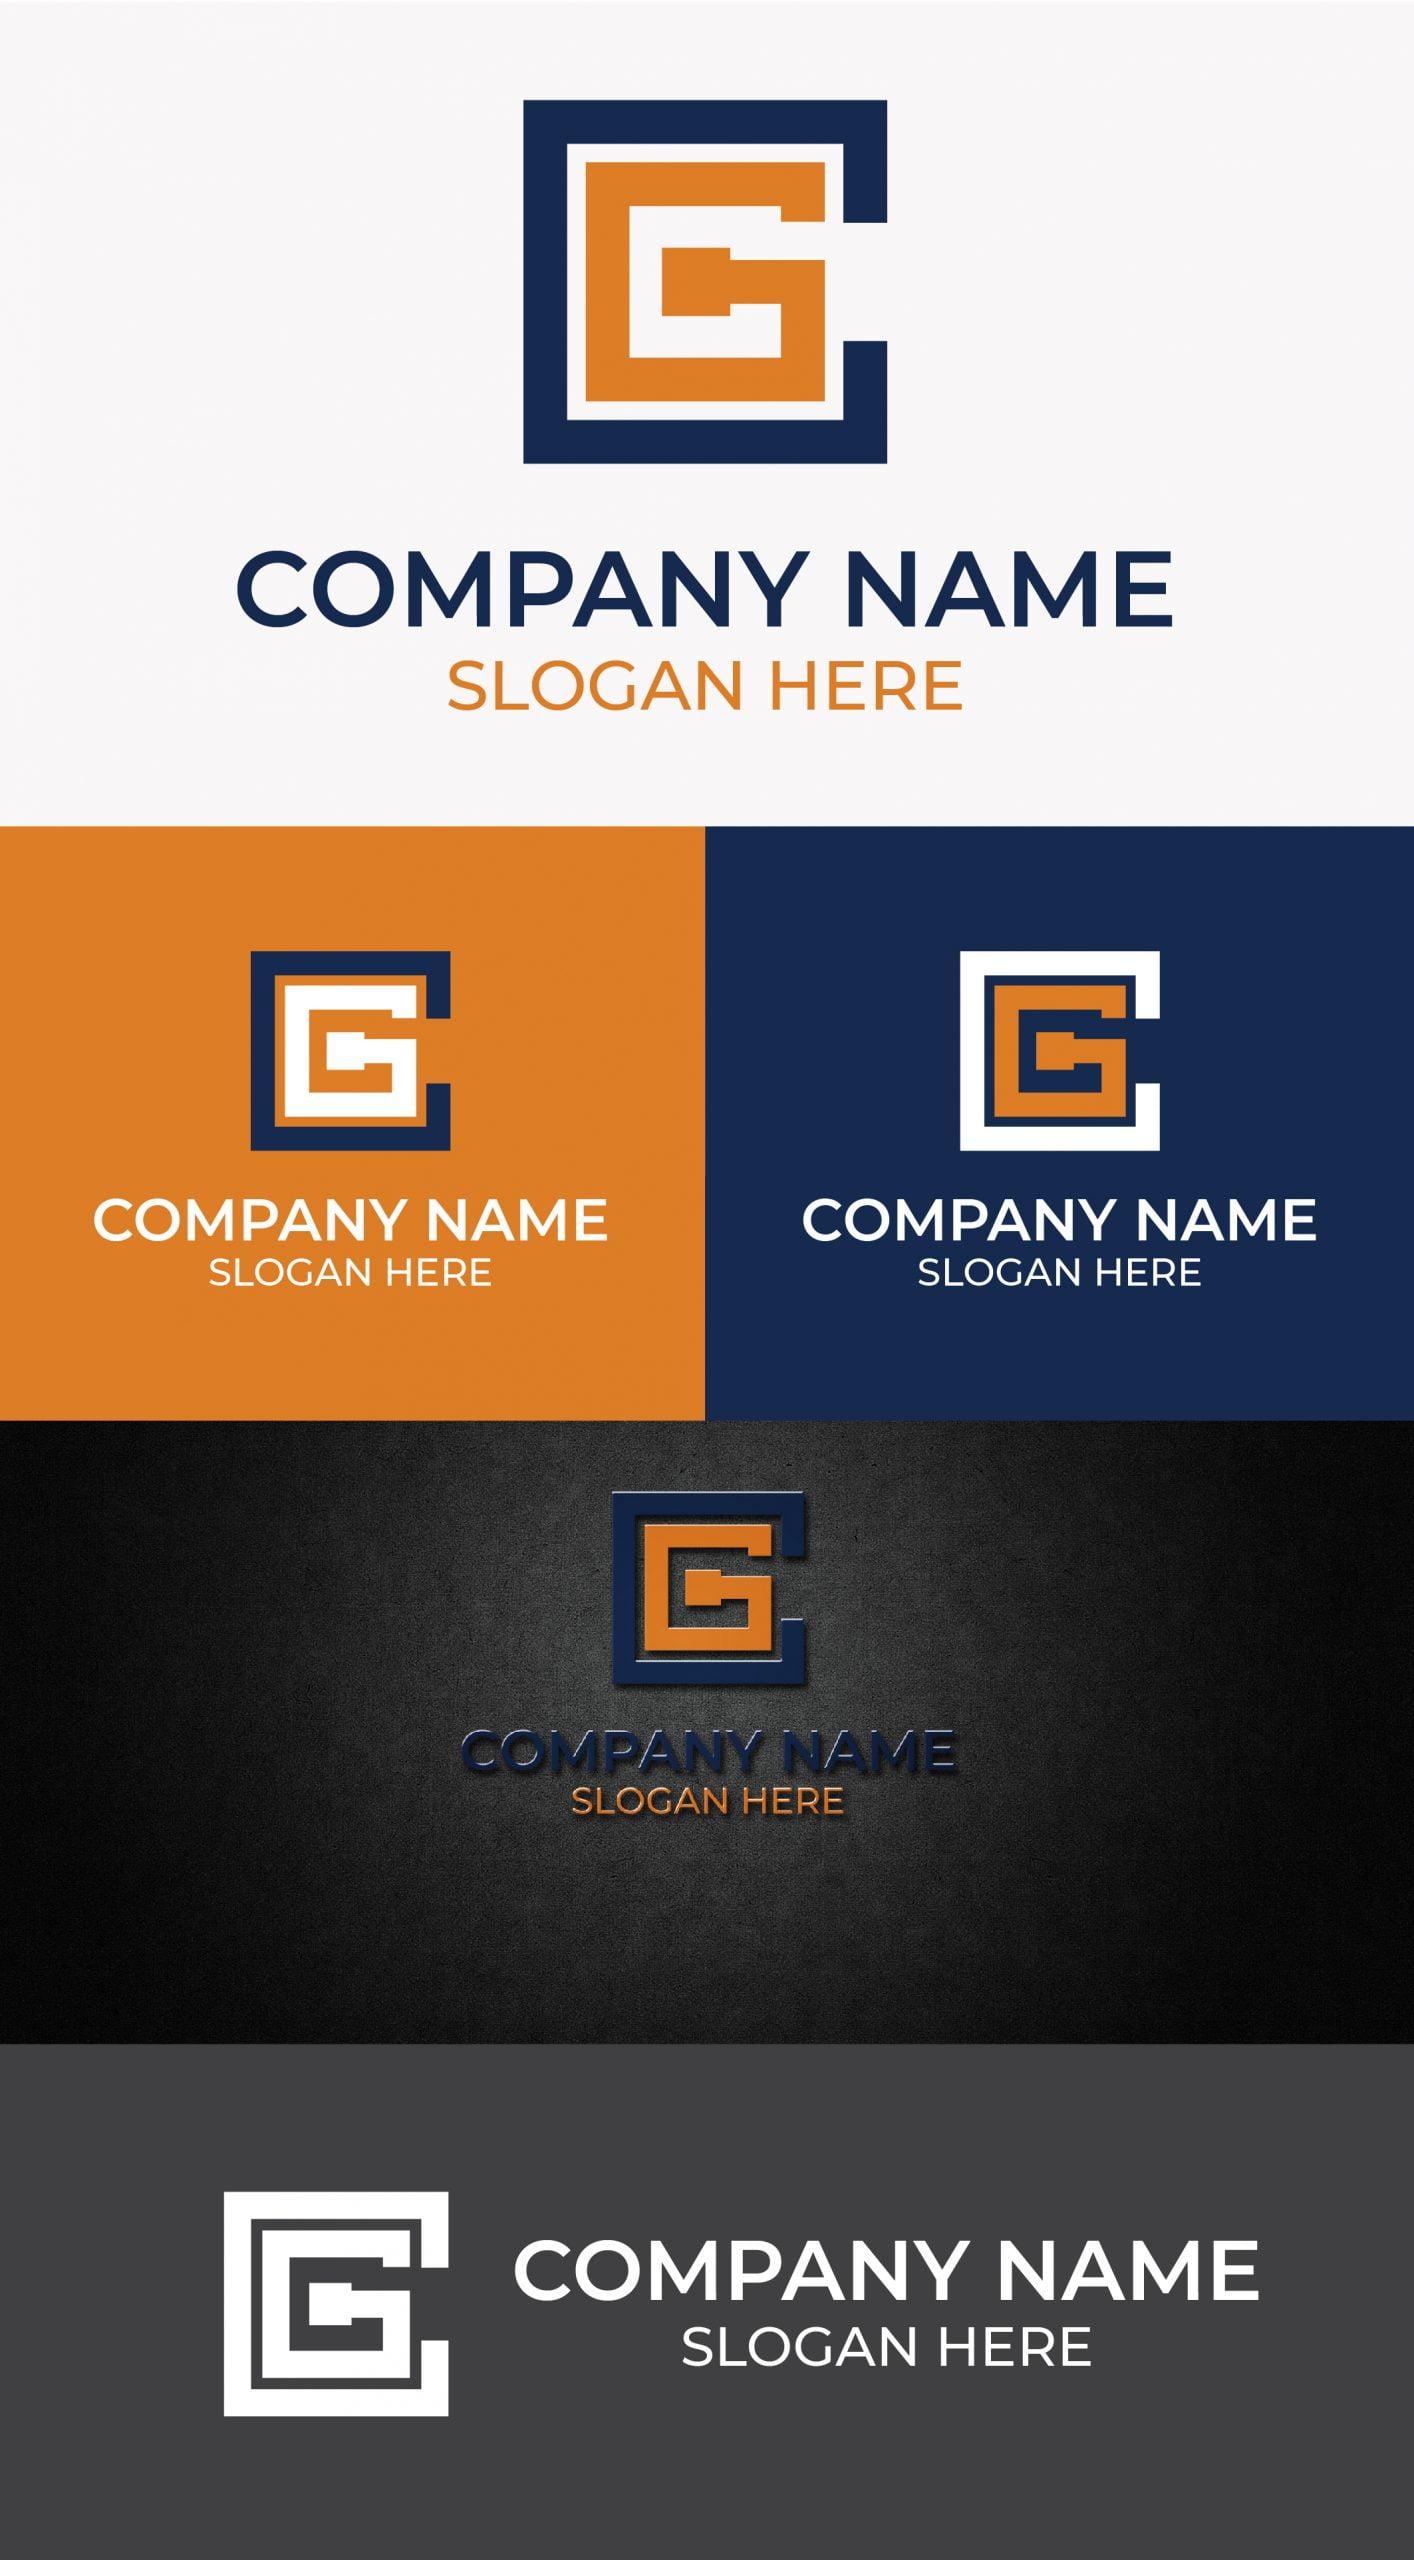 CG Monogram logo Template